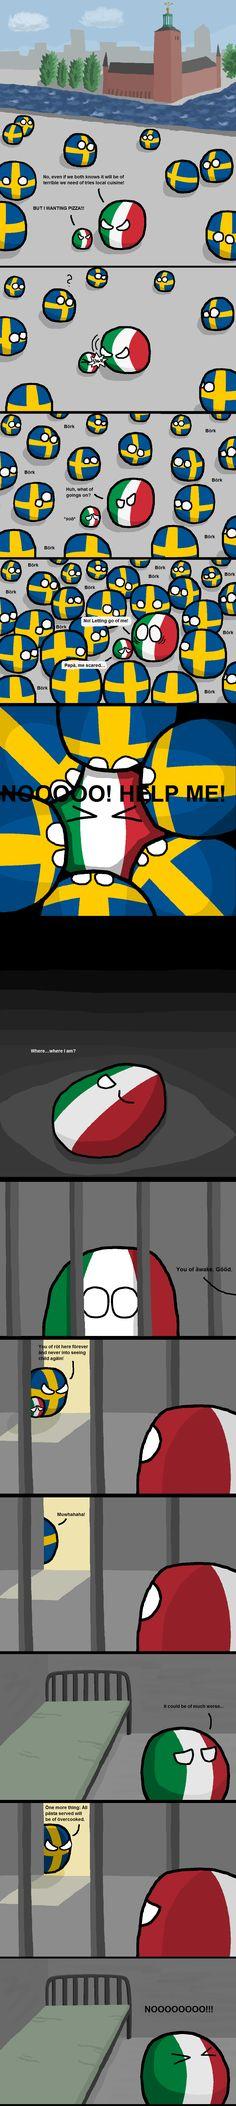 """Bad parenting"" ( Sweden, Italy ) by peritektikum #polandball #countryball #flagball"